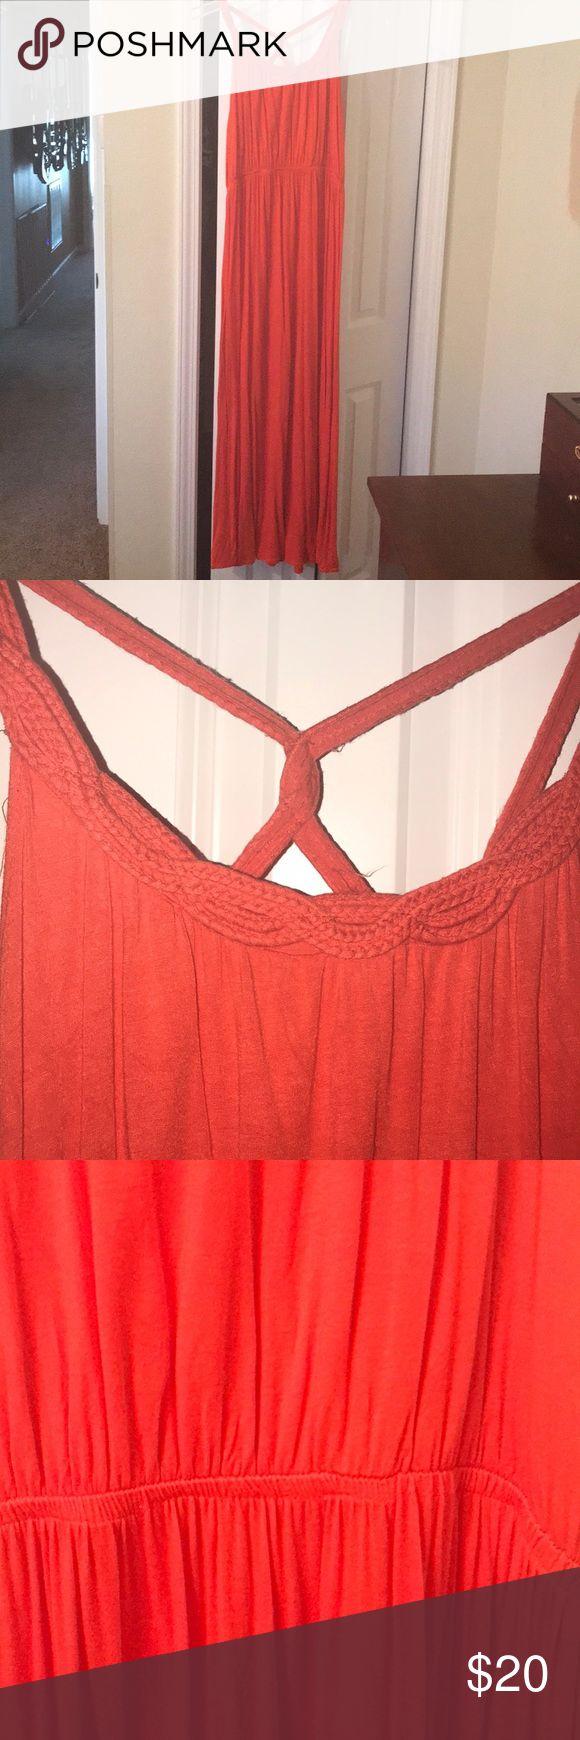 Beautiful Orange Maxi Orange Maxi Dress Clothes Design